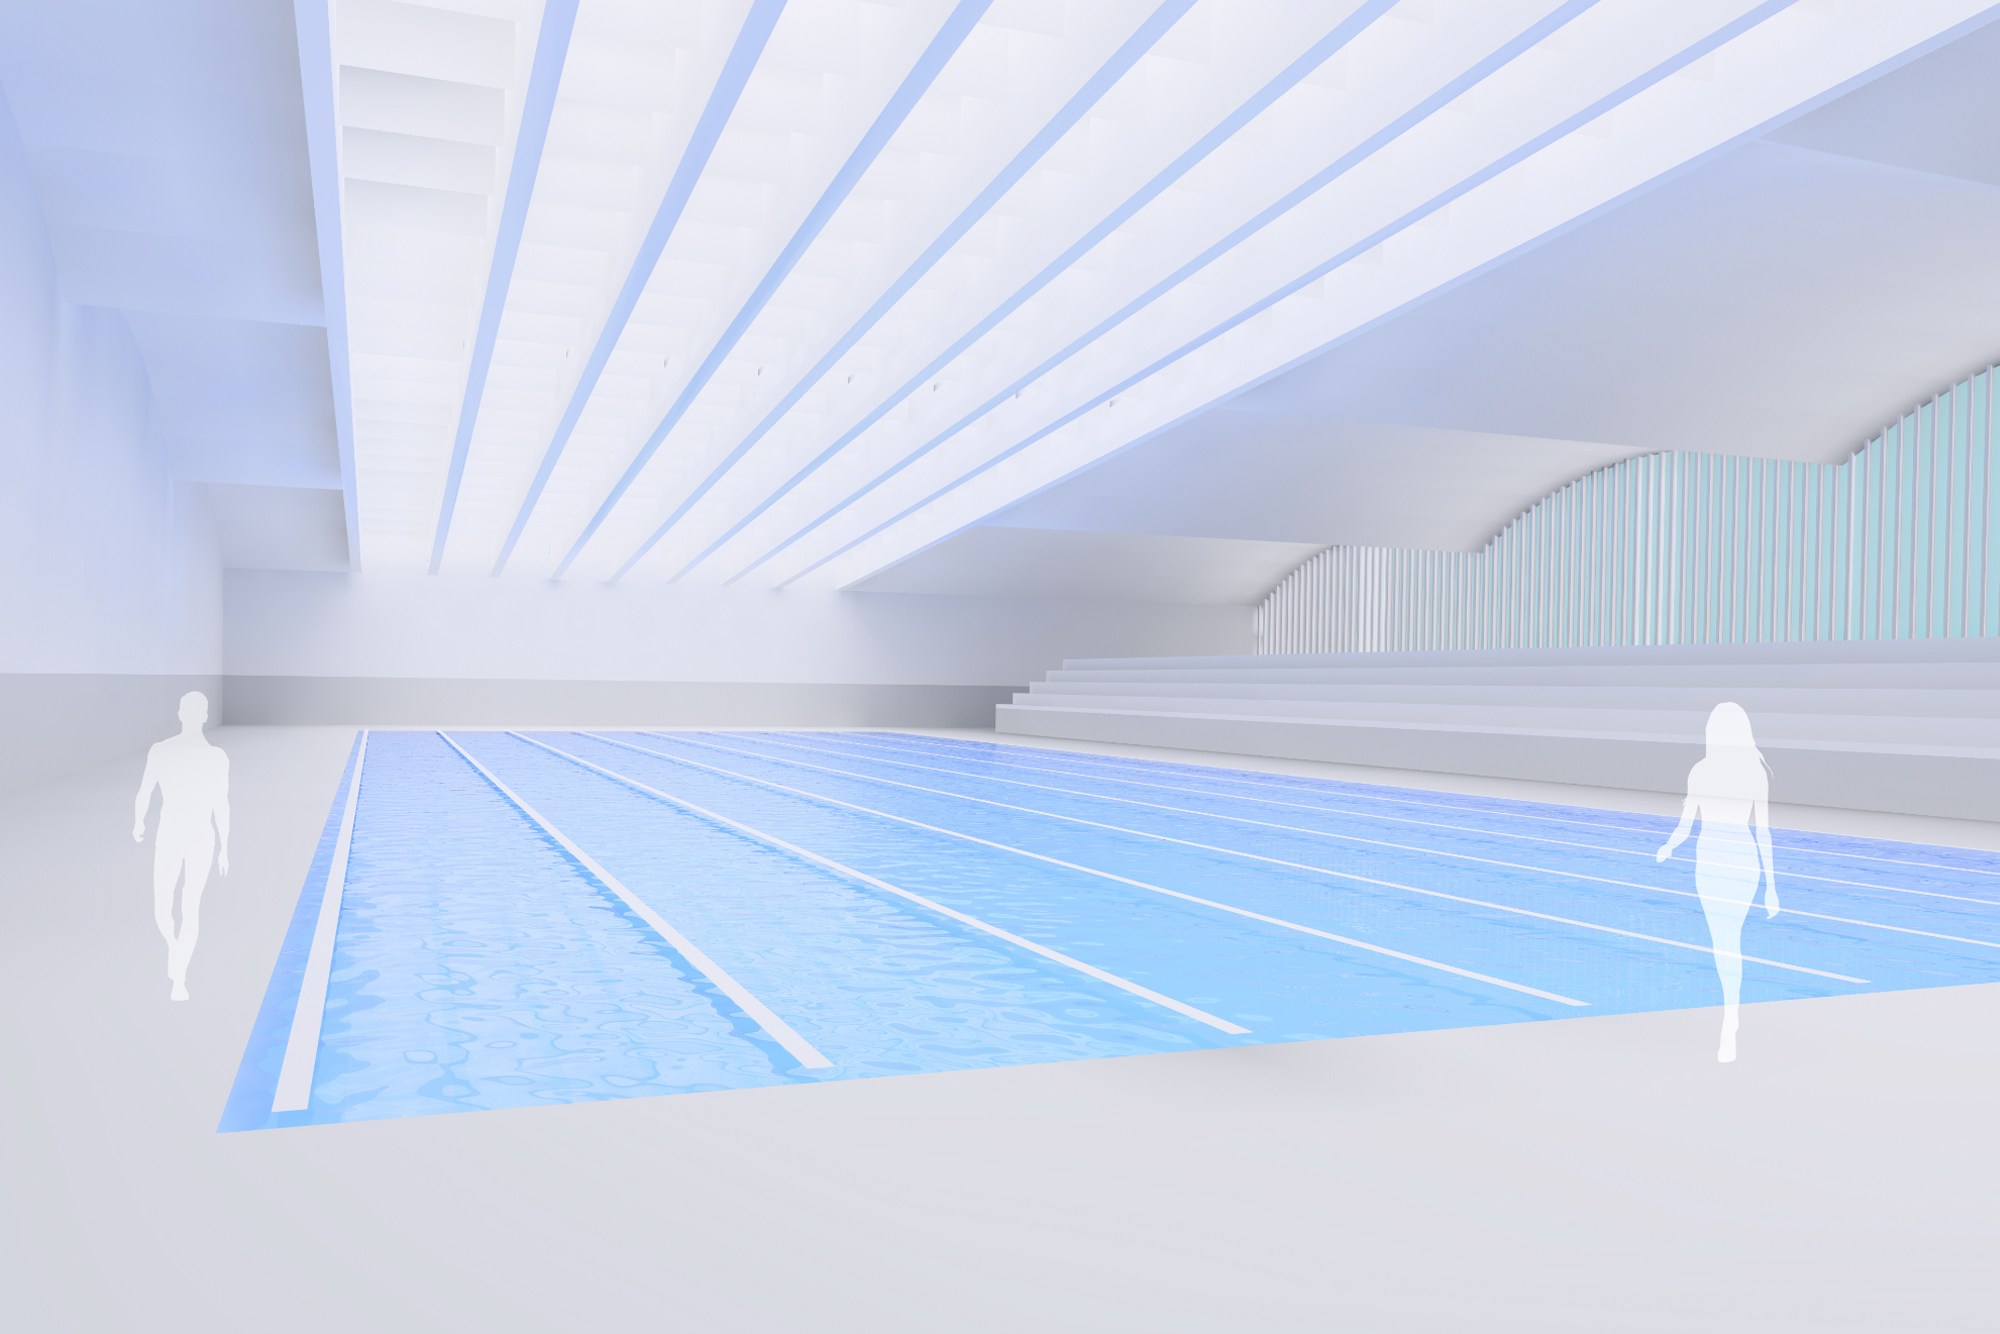 50m Swimming Pool